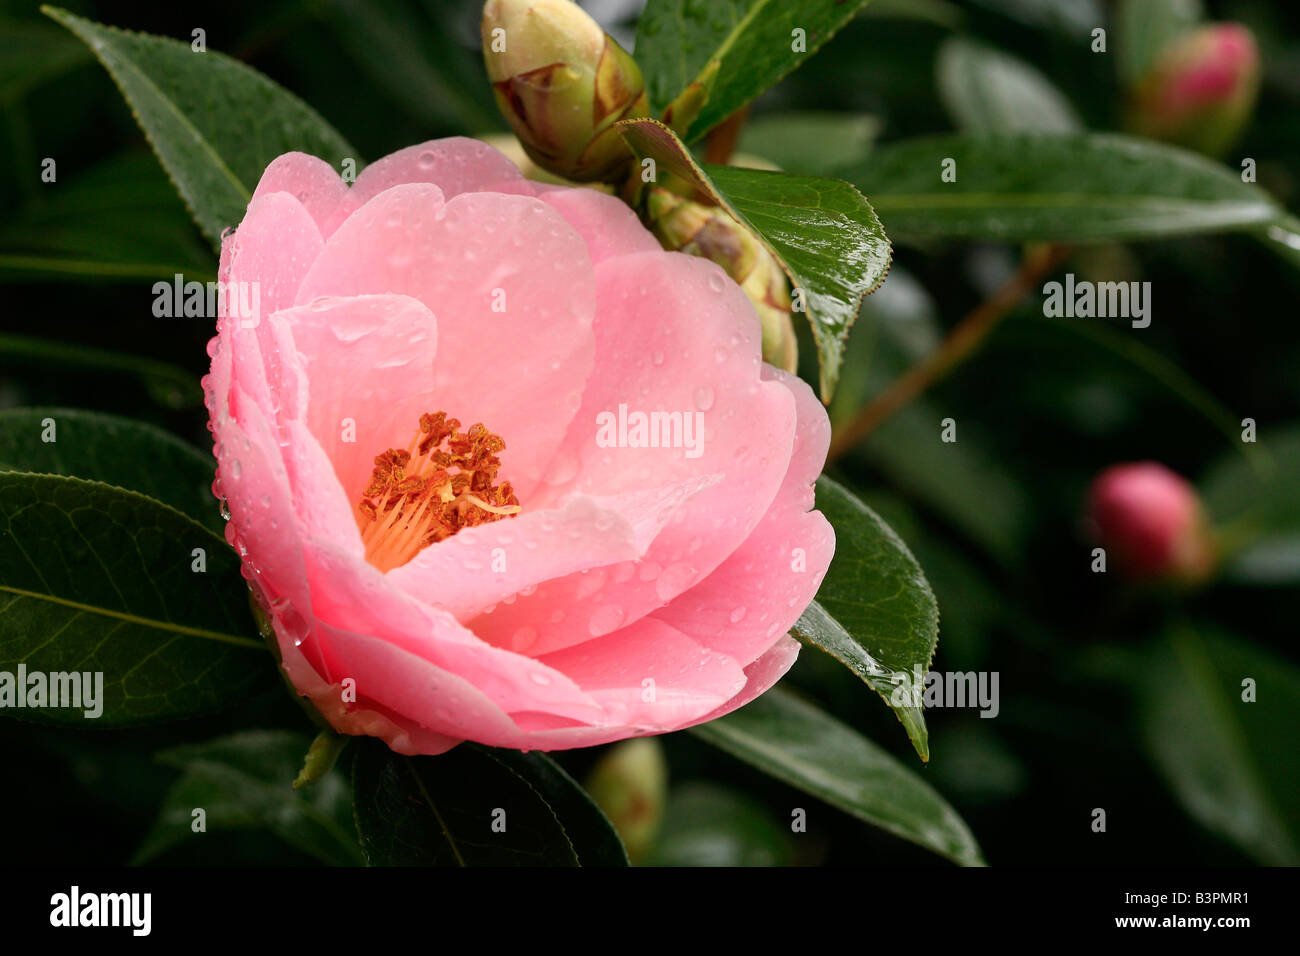 Camellia 'E. G. Waterhouse' - Stock Image